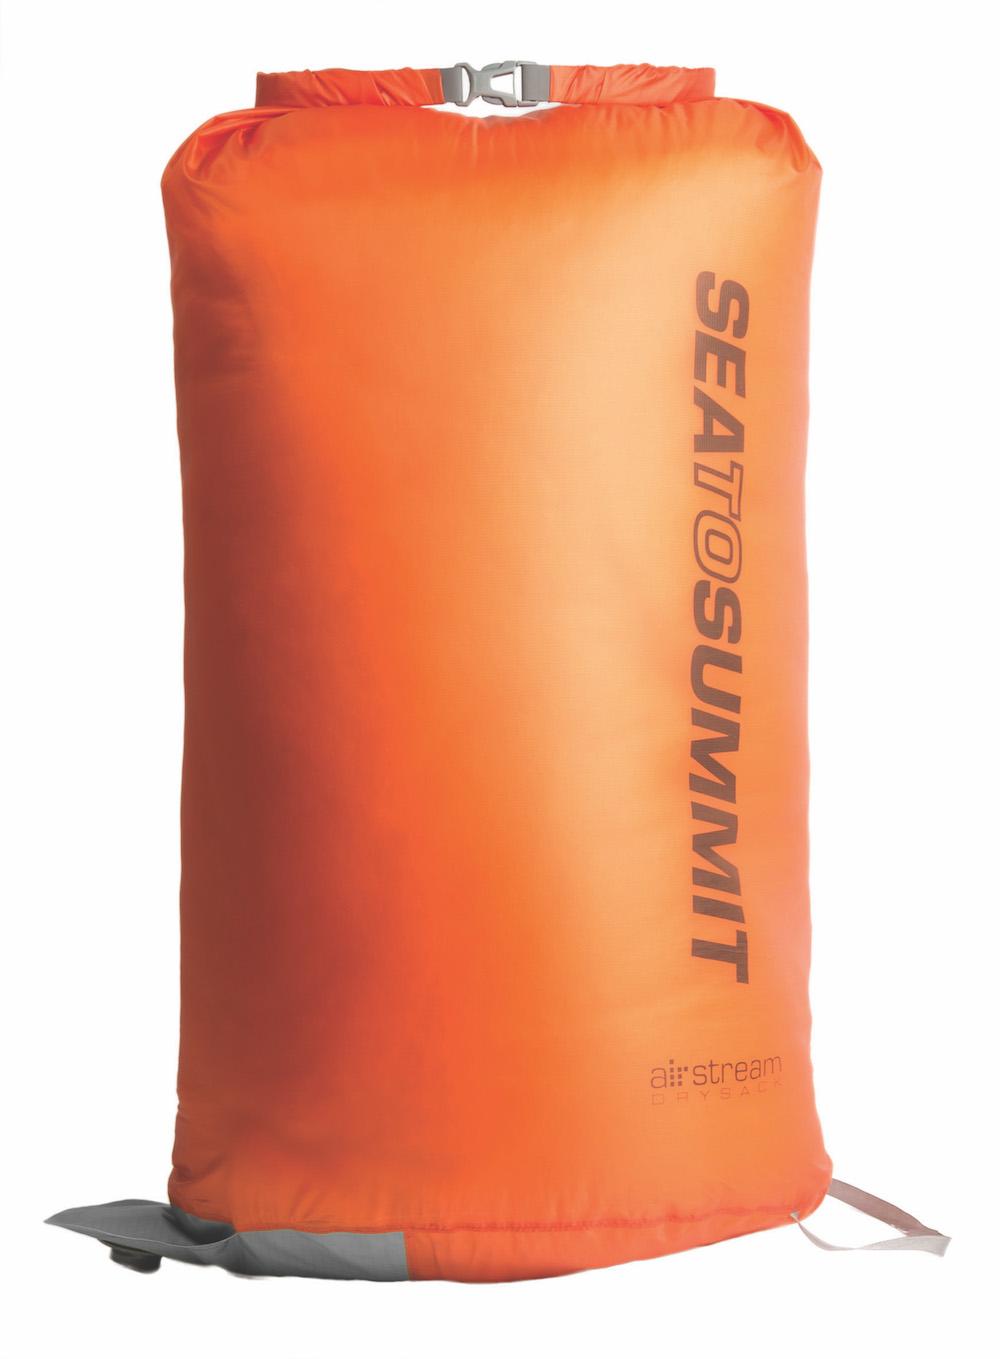 Sea To Summit Drysac 20 L Air Stream - Gonfleur matelas